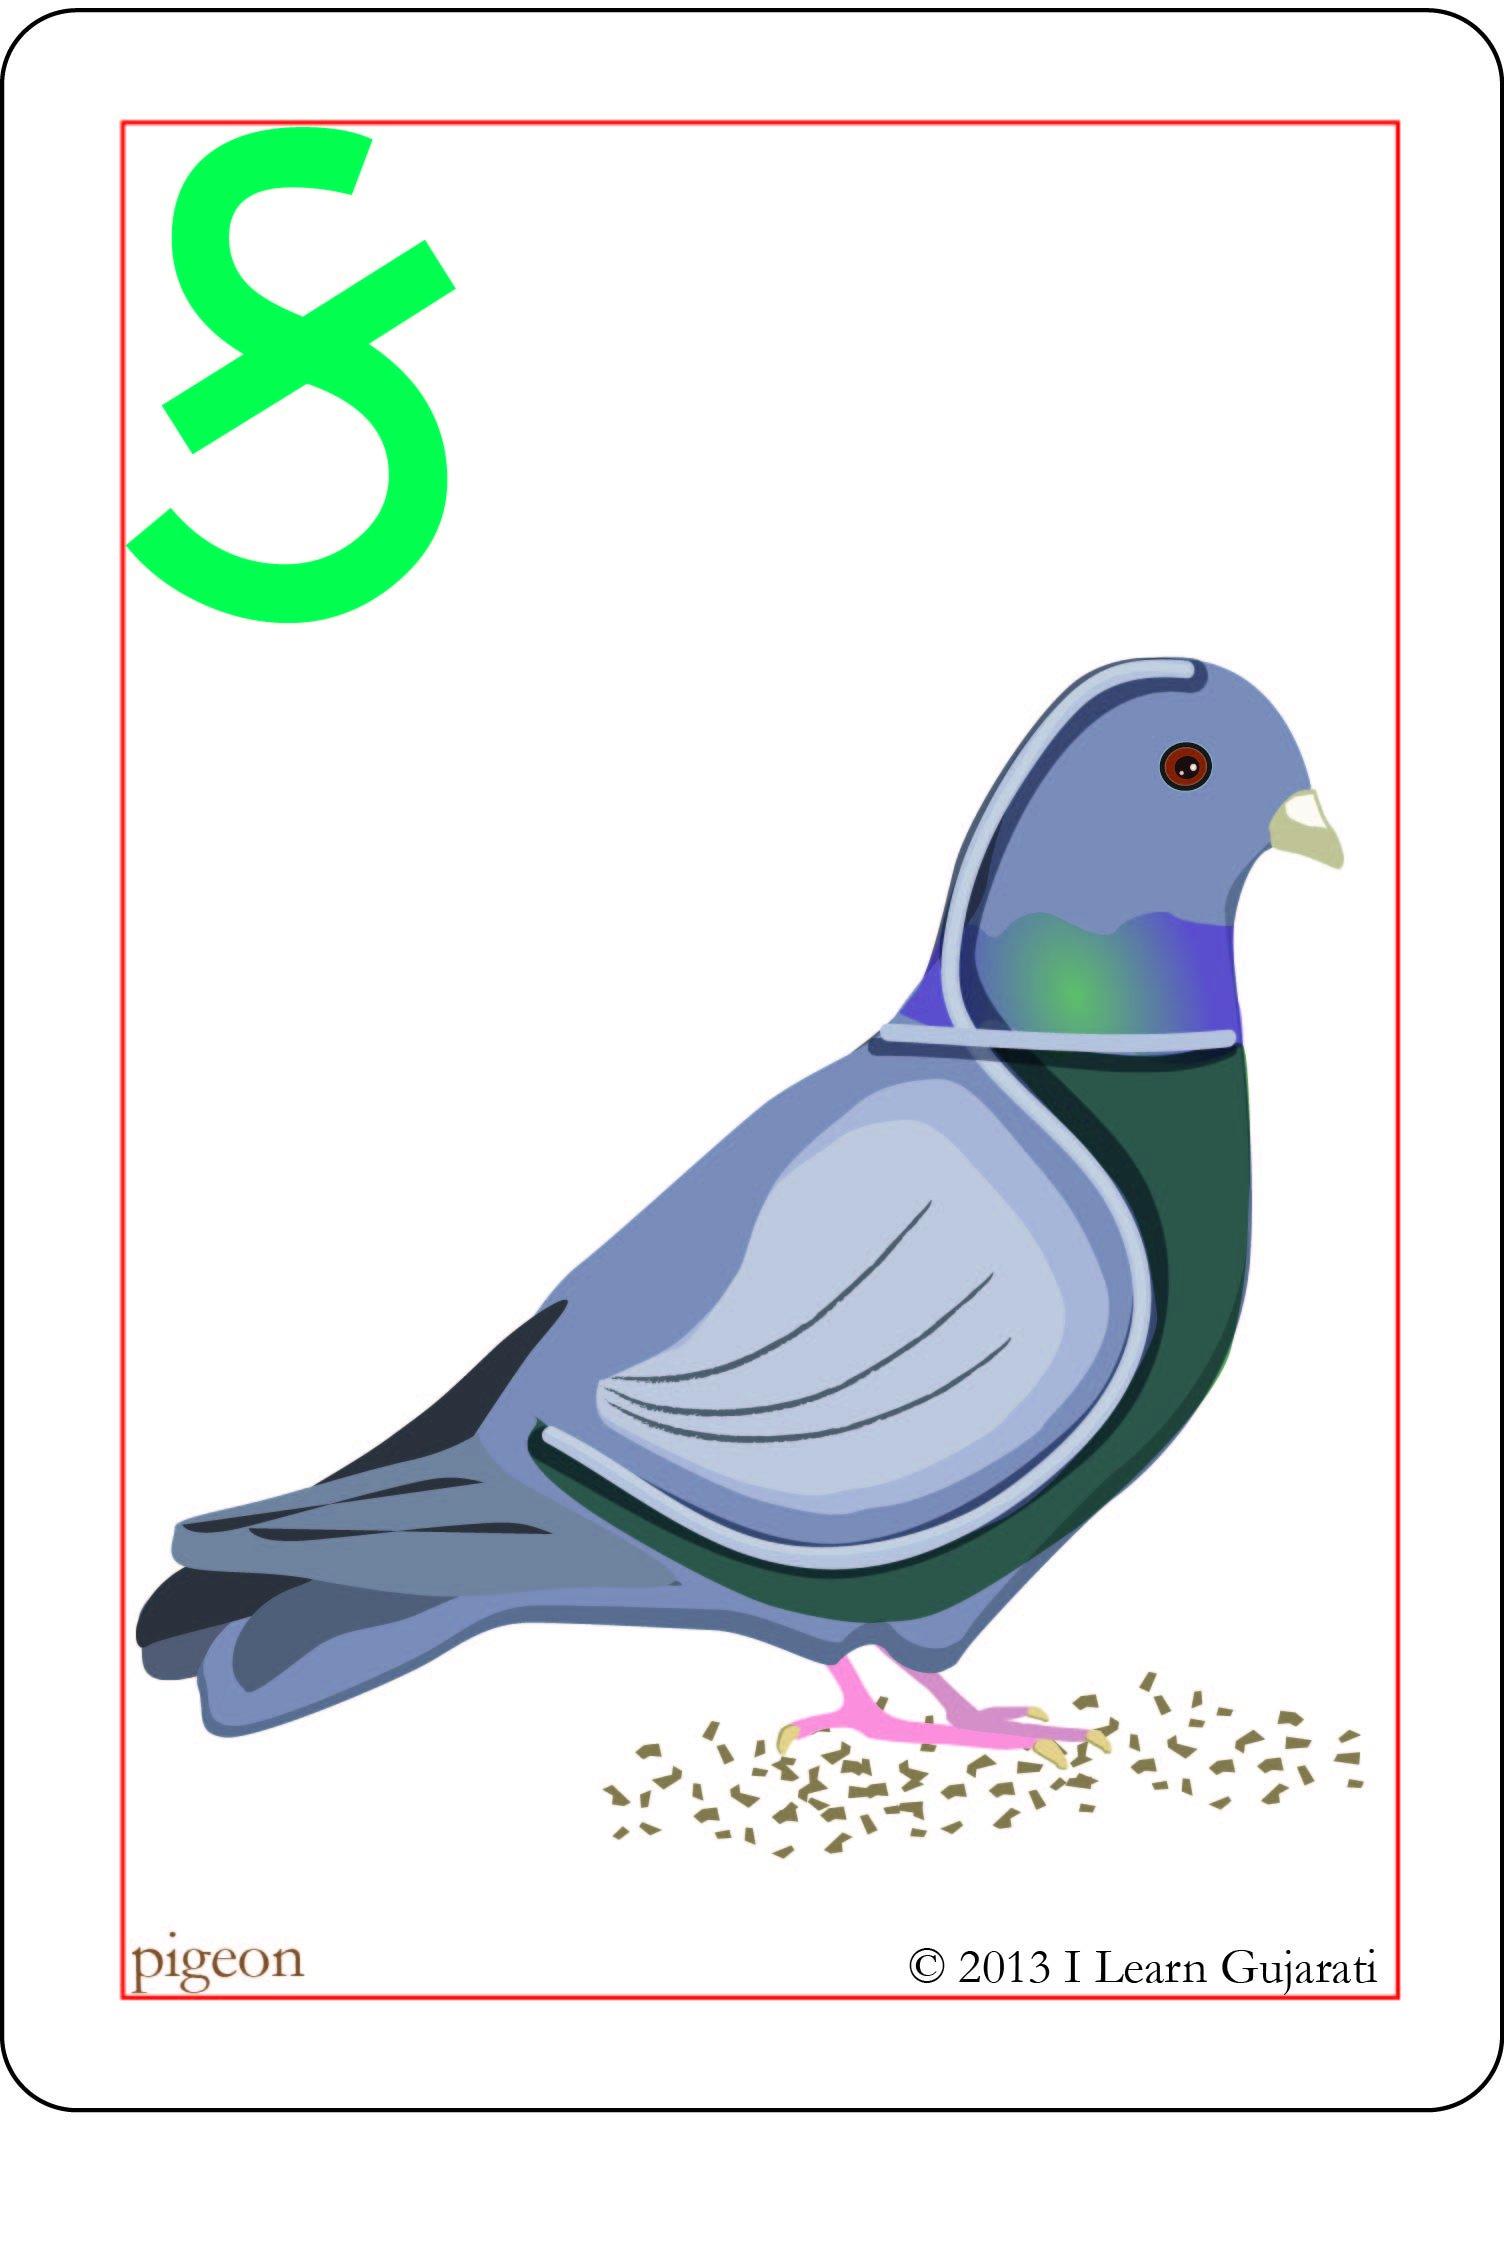 gujarati alphabet flash cards english and gujarati edition anshu jain 9780982682715 books amazonca